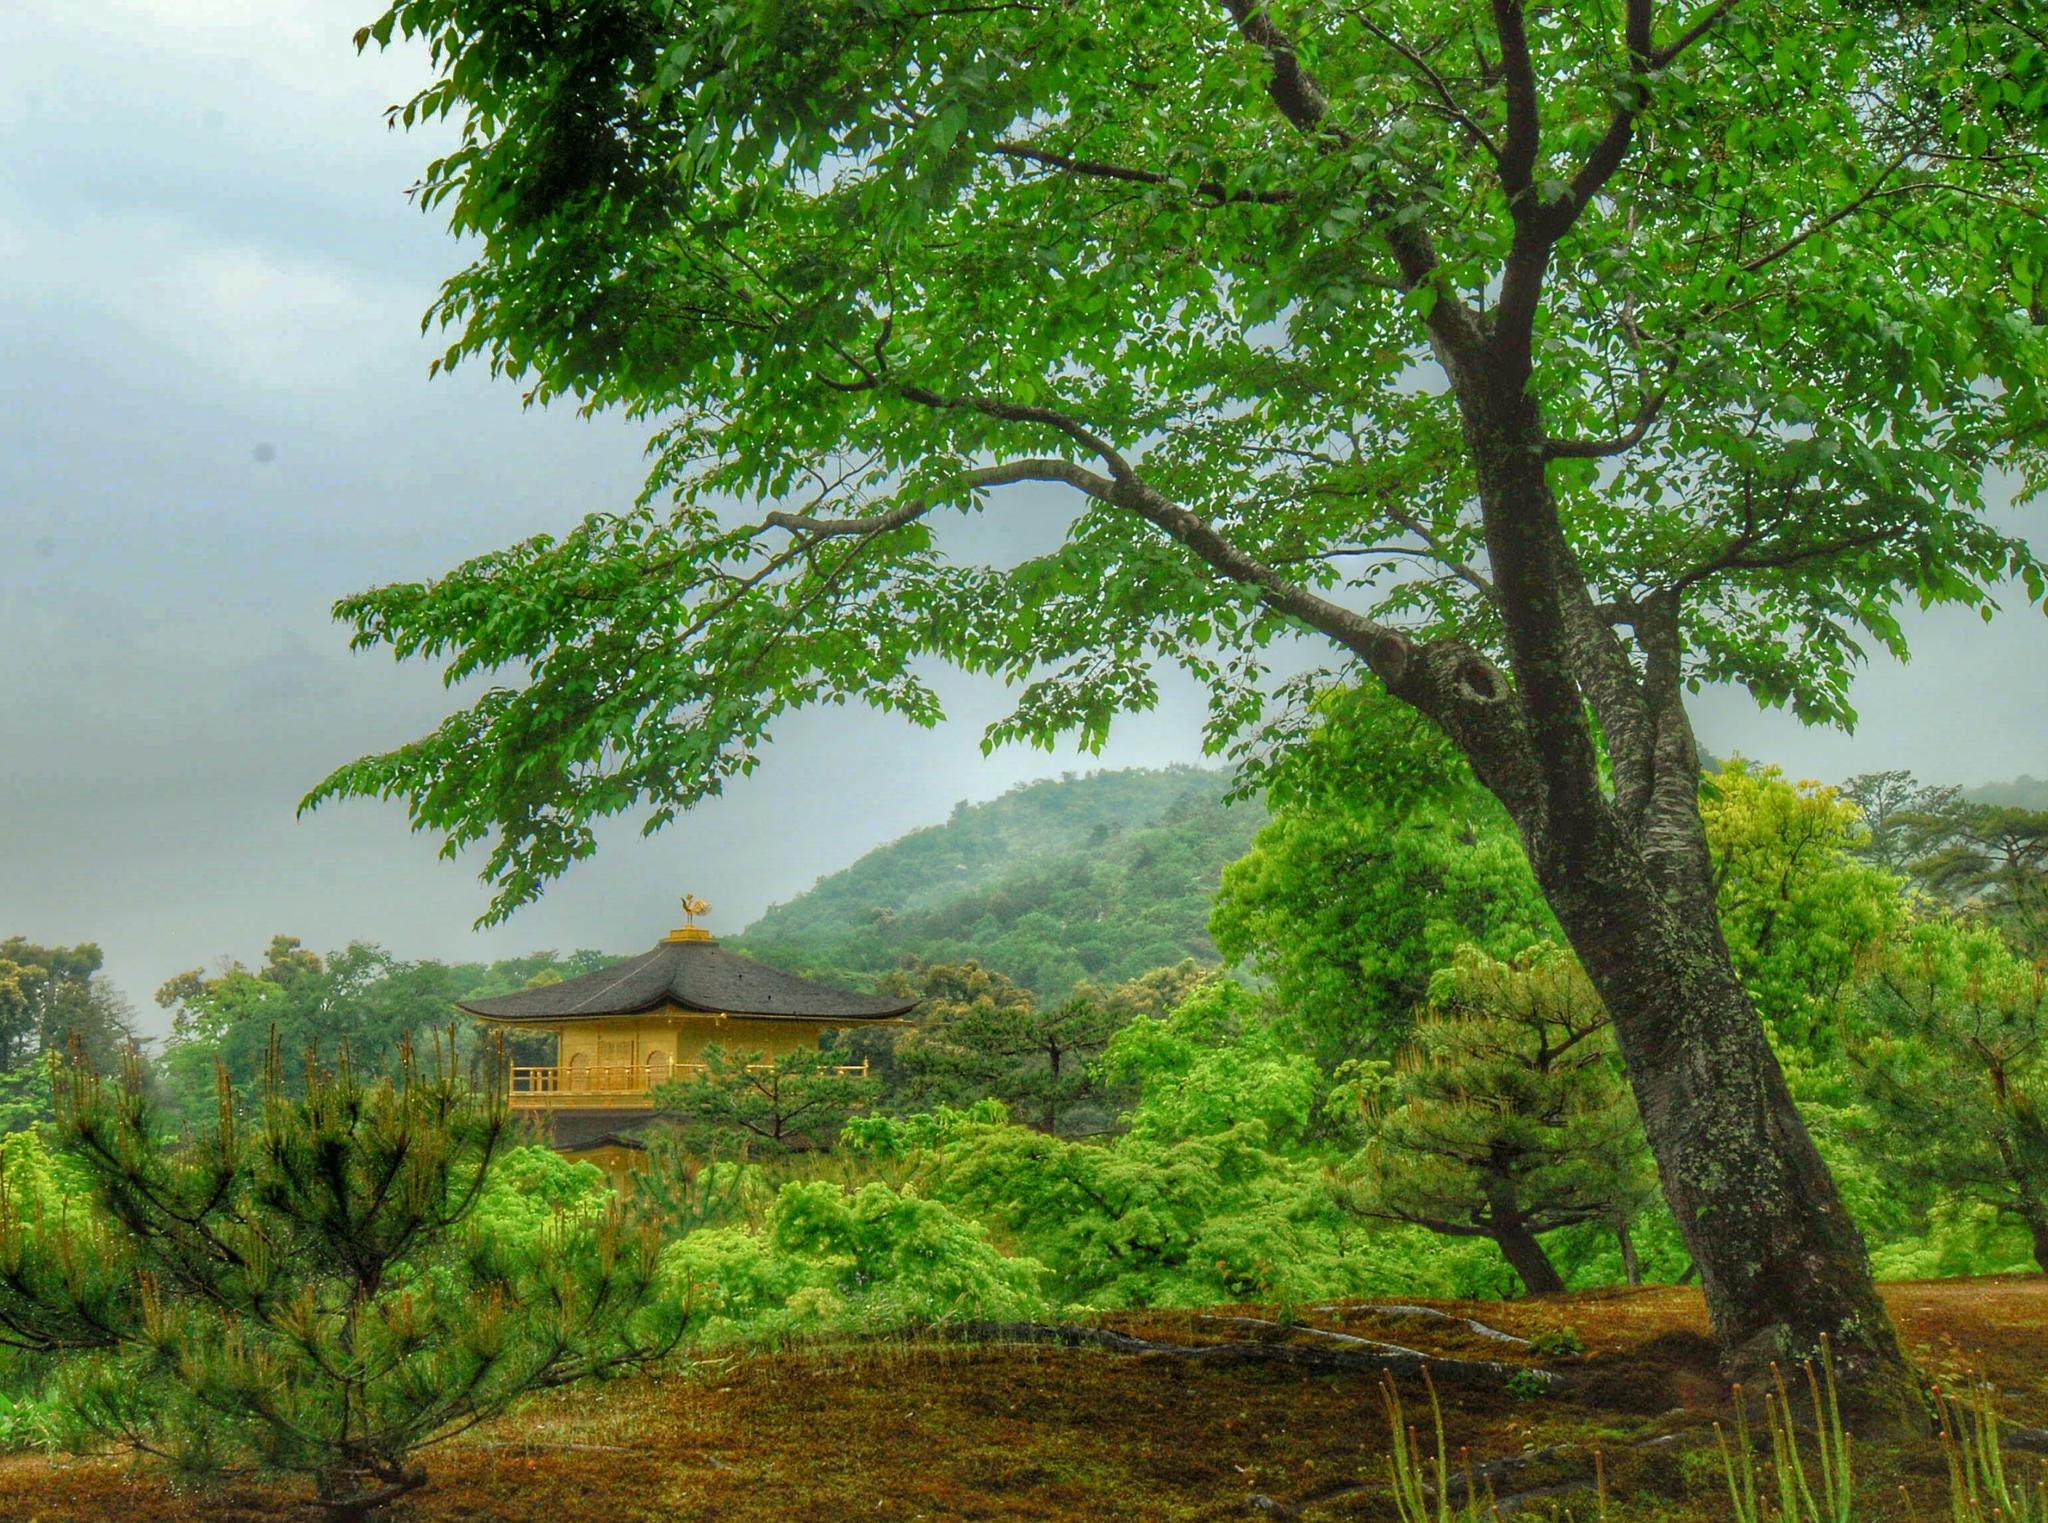 The Golden pavillion by Ming_Bear